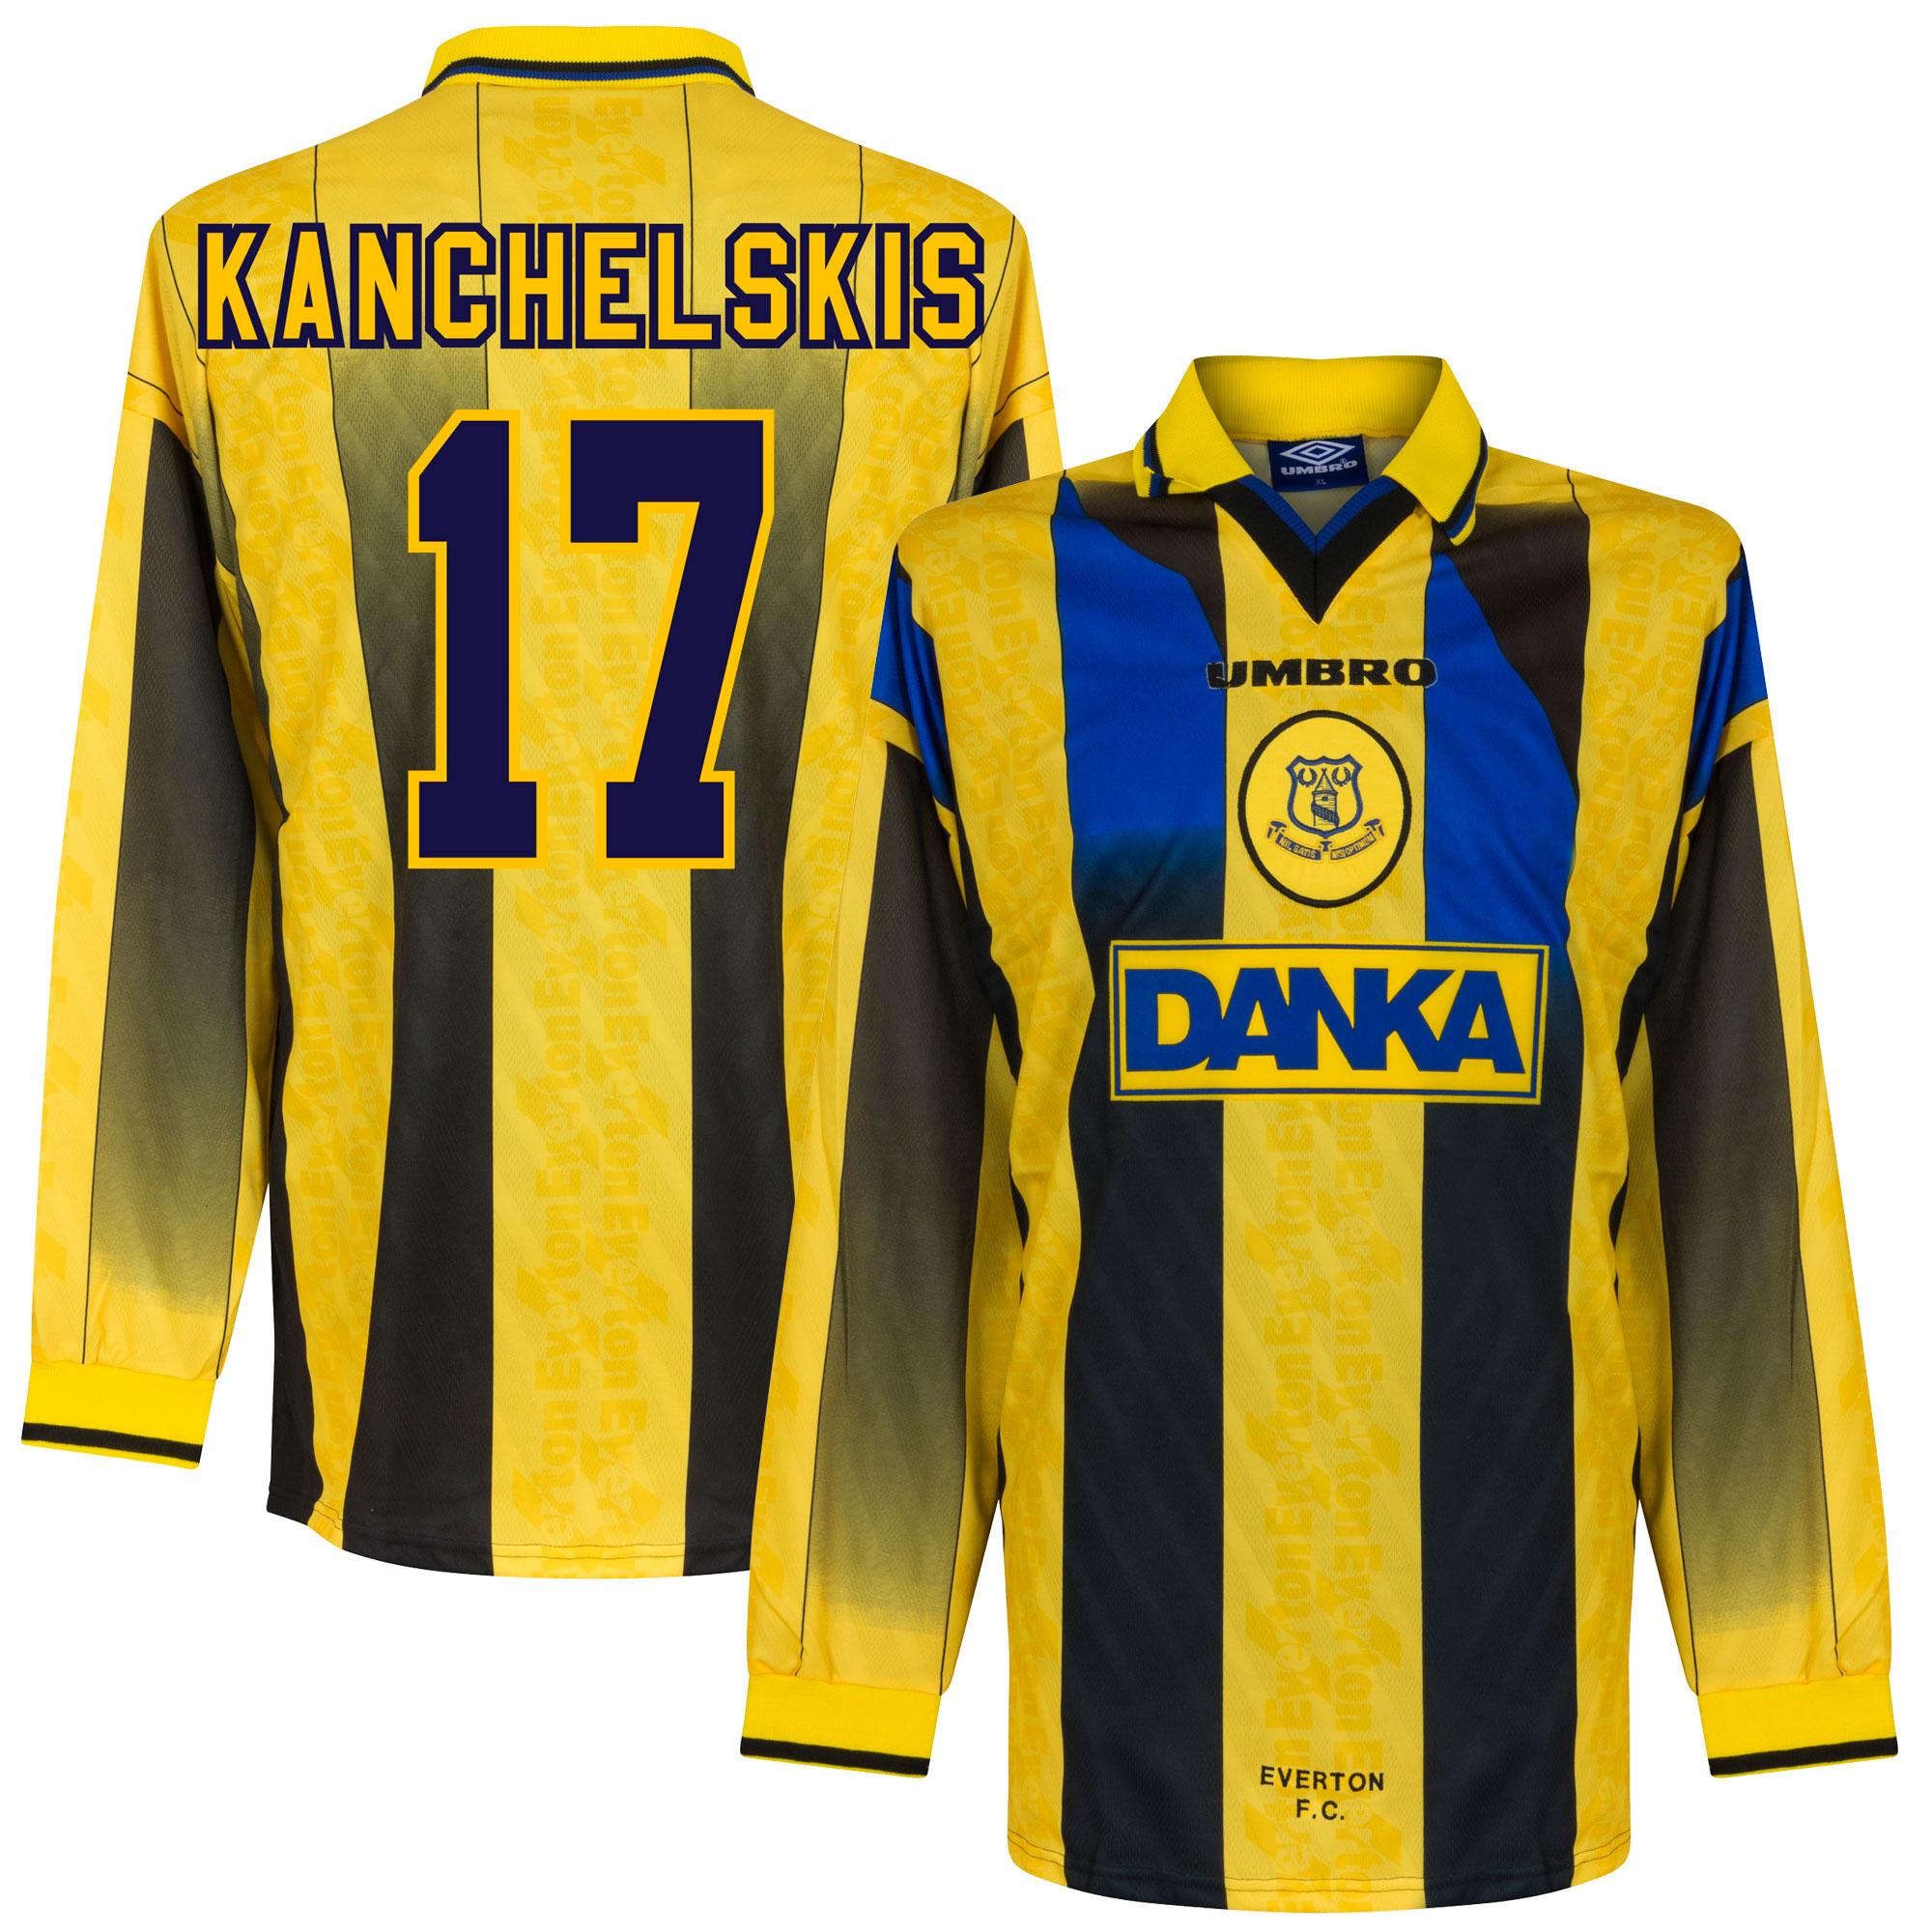 96-97 Everton Away L/S Players Jersey + Kanchelskis 17 - XL